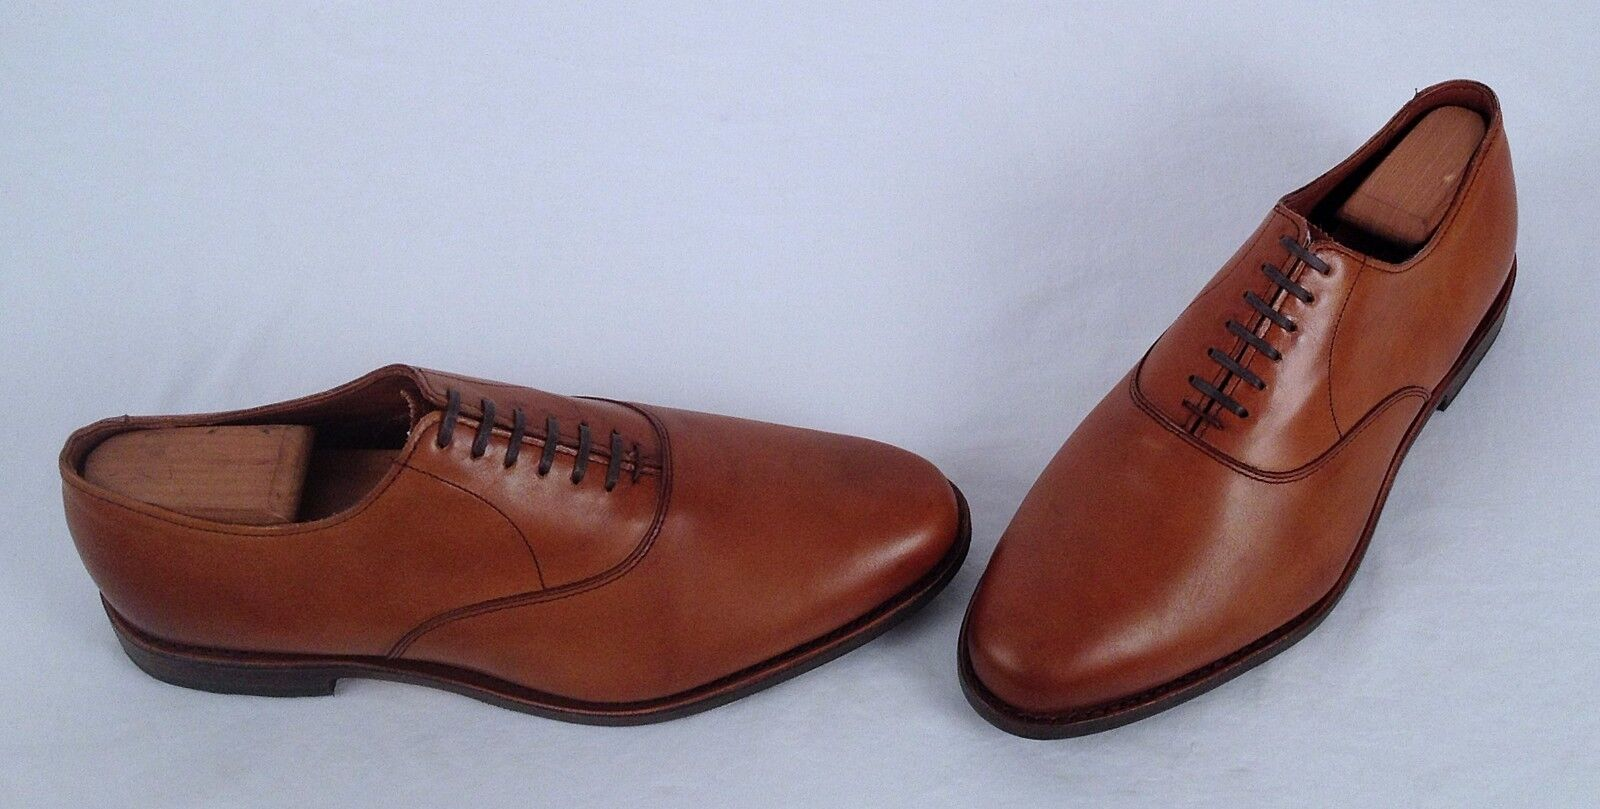 nuevo    Allen Edmonds 'Carlyle' Derby Oxford-Nogal Tamaño 10 3E